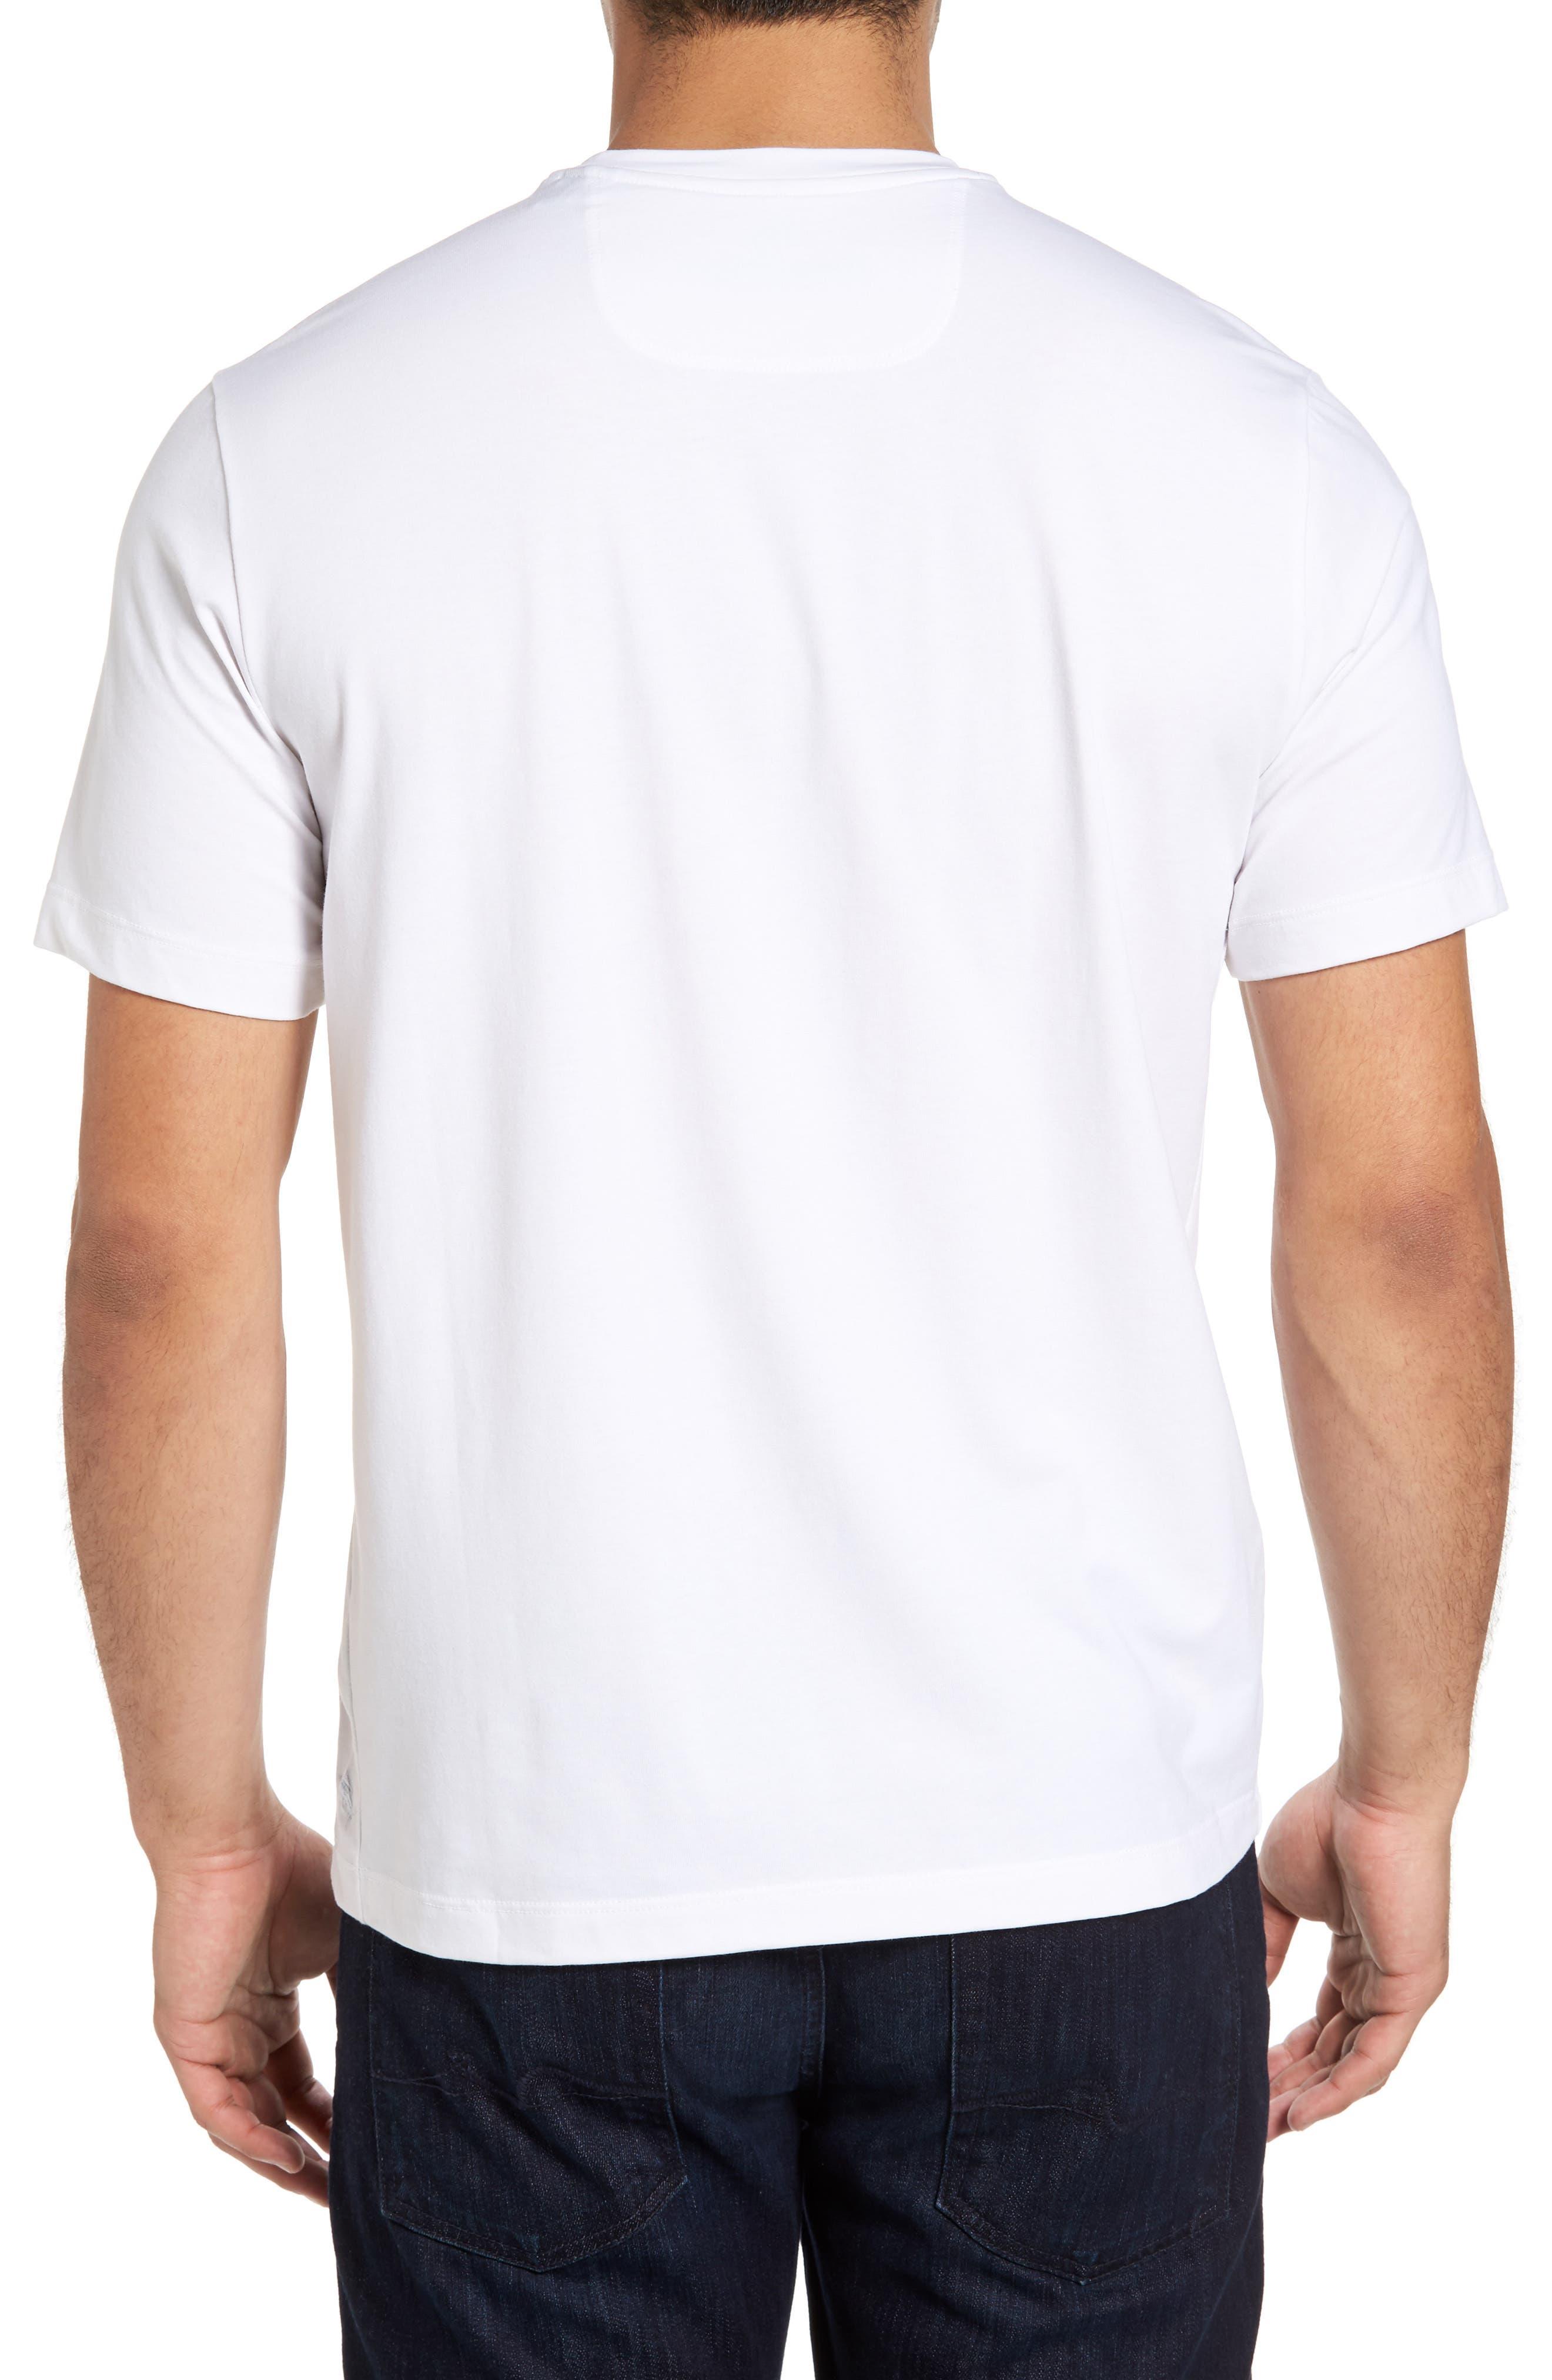 Tropicool T-Shirt,                             Alternate thumbnail 16, color,